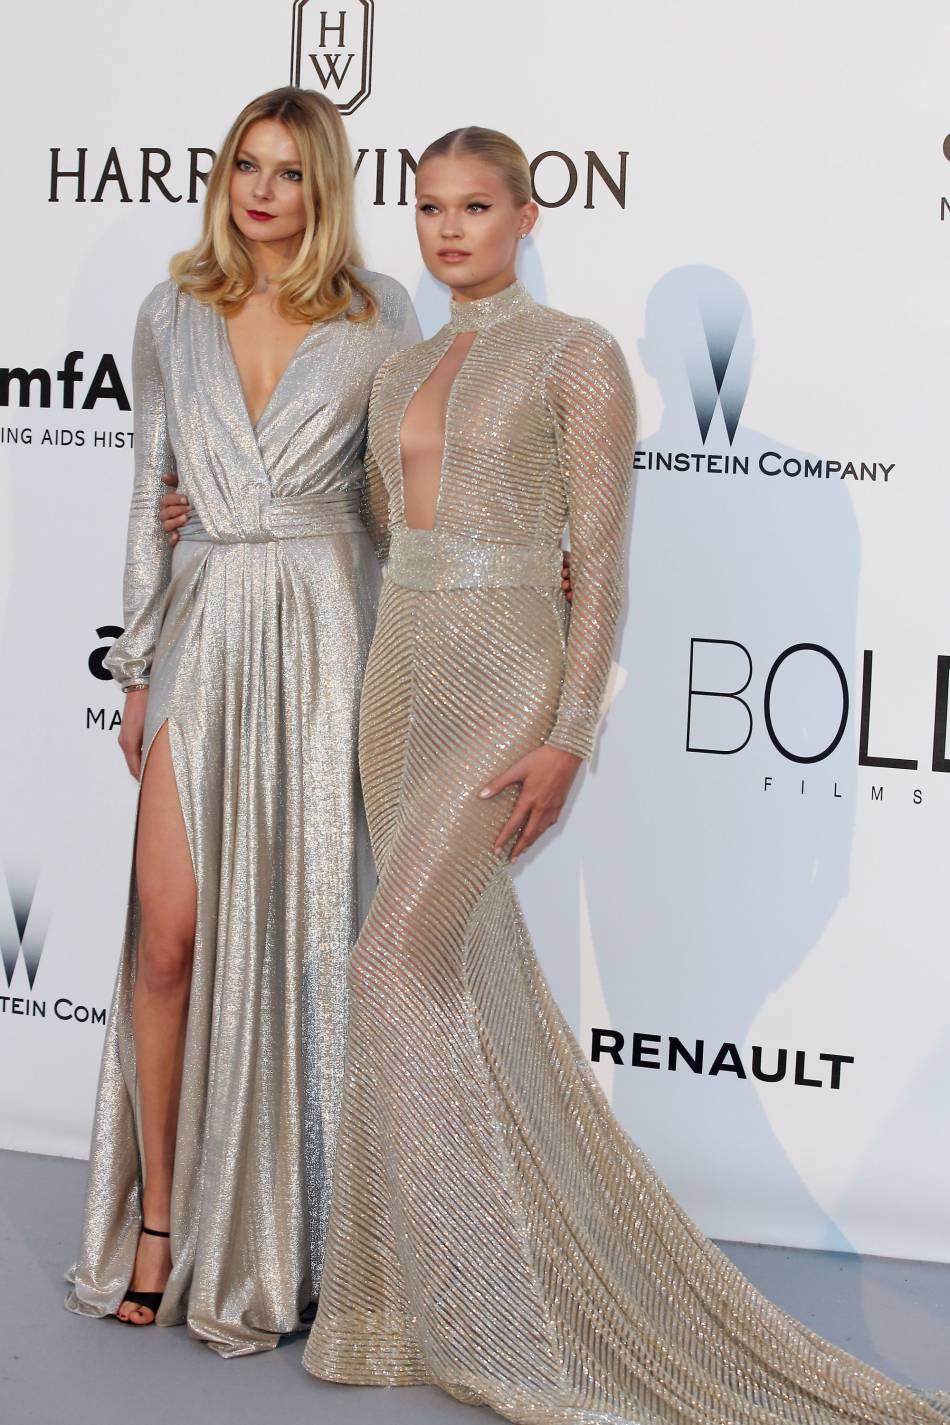 Eniko Mihalik et Vita Sidorkinaau gala de l'amfAR Cinema against AIDS le 19 mai 2016 à Cannes.